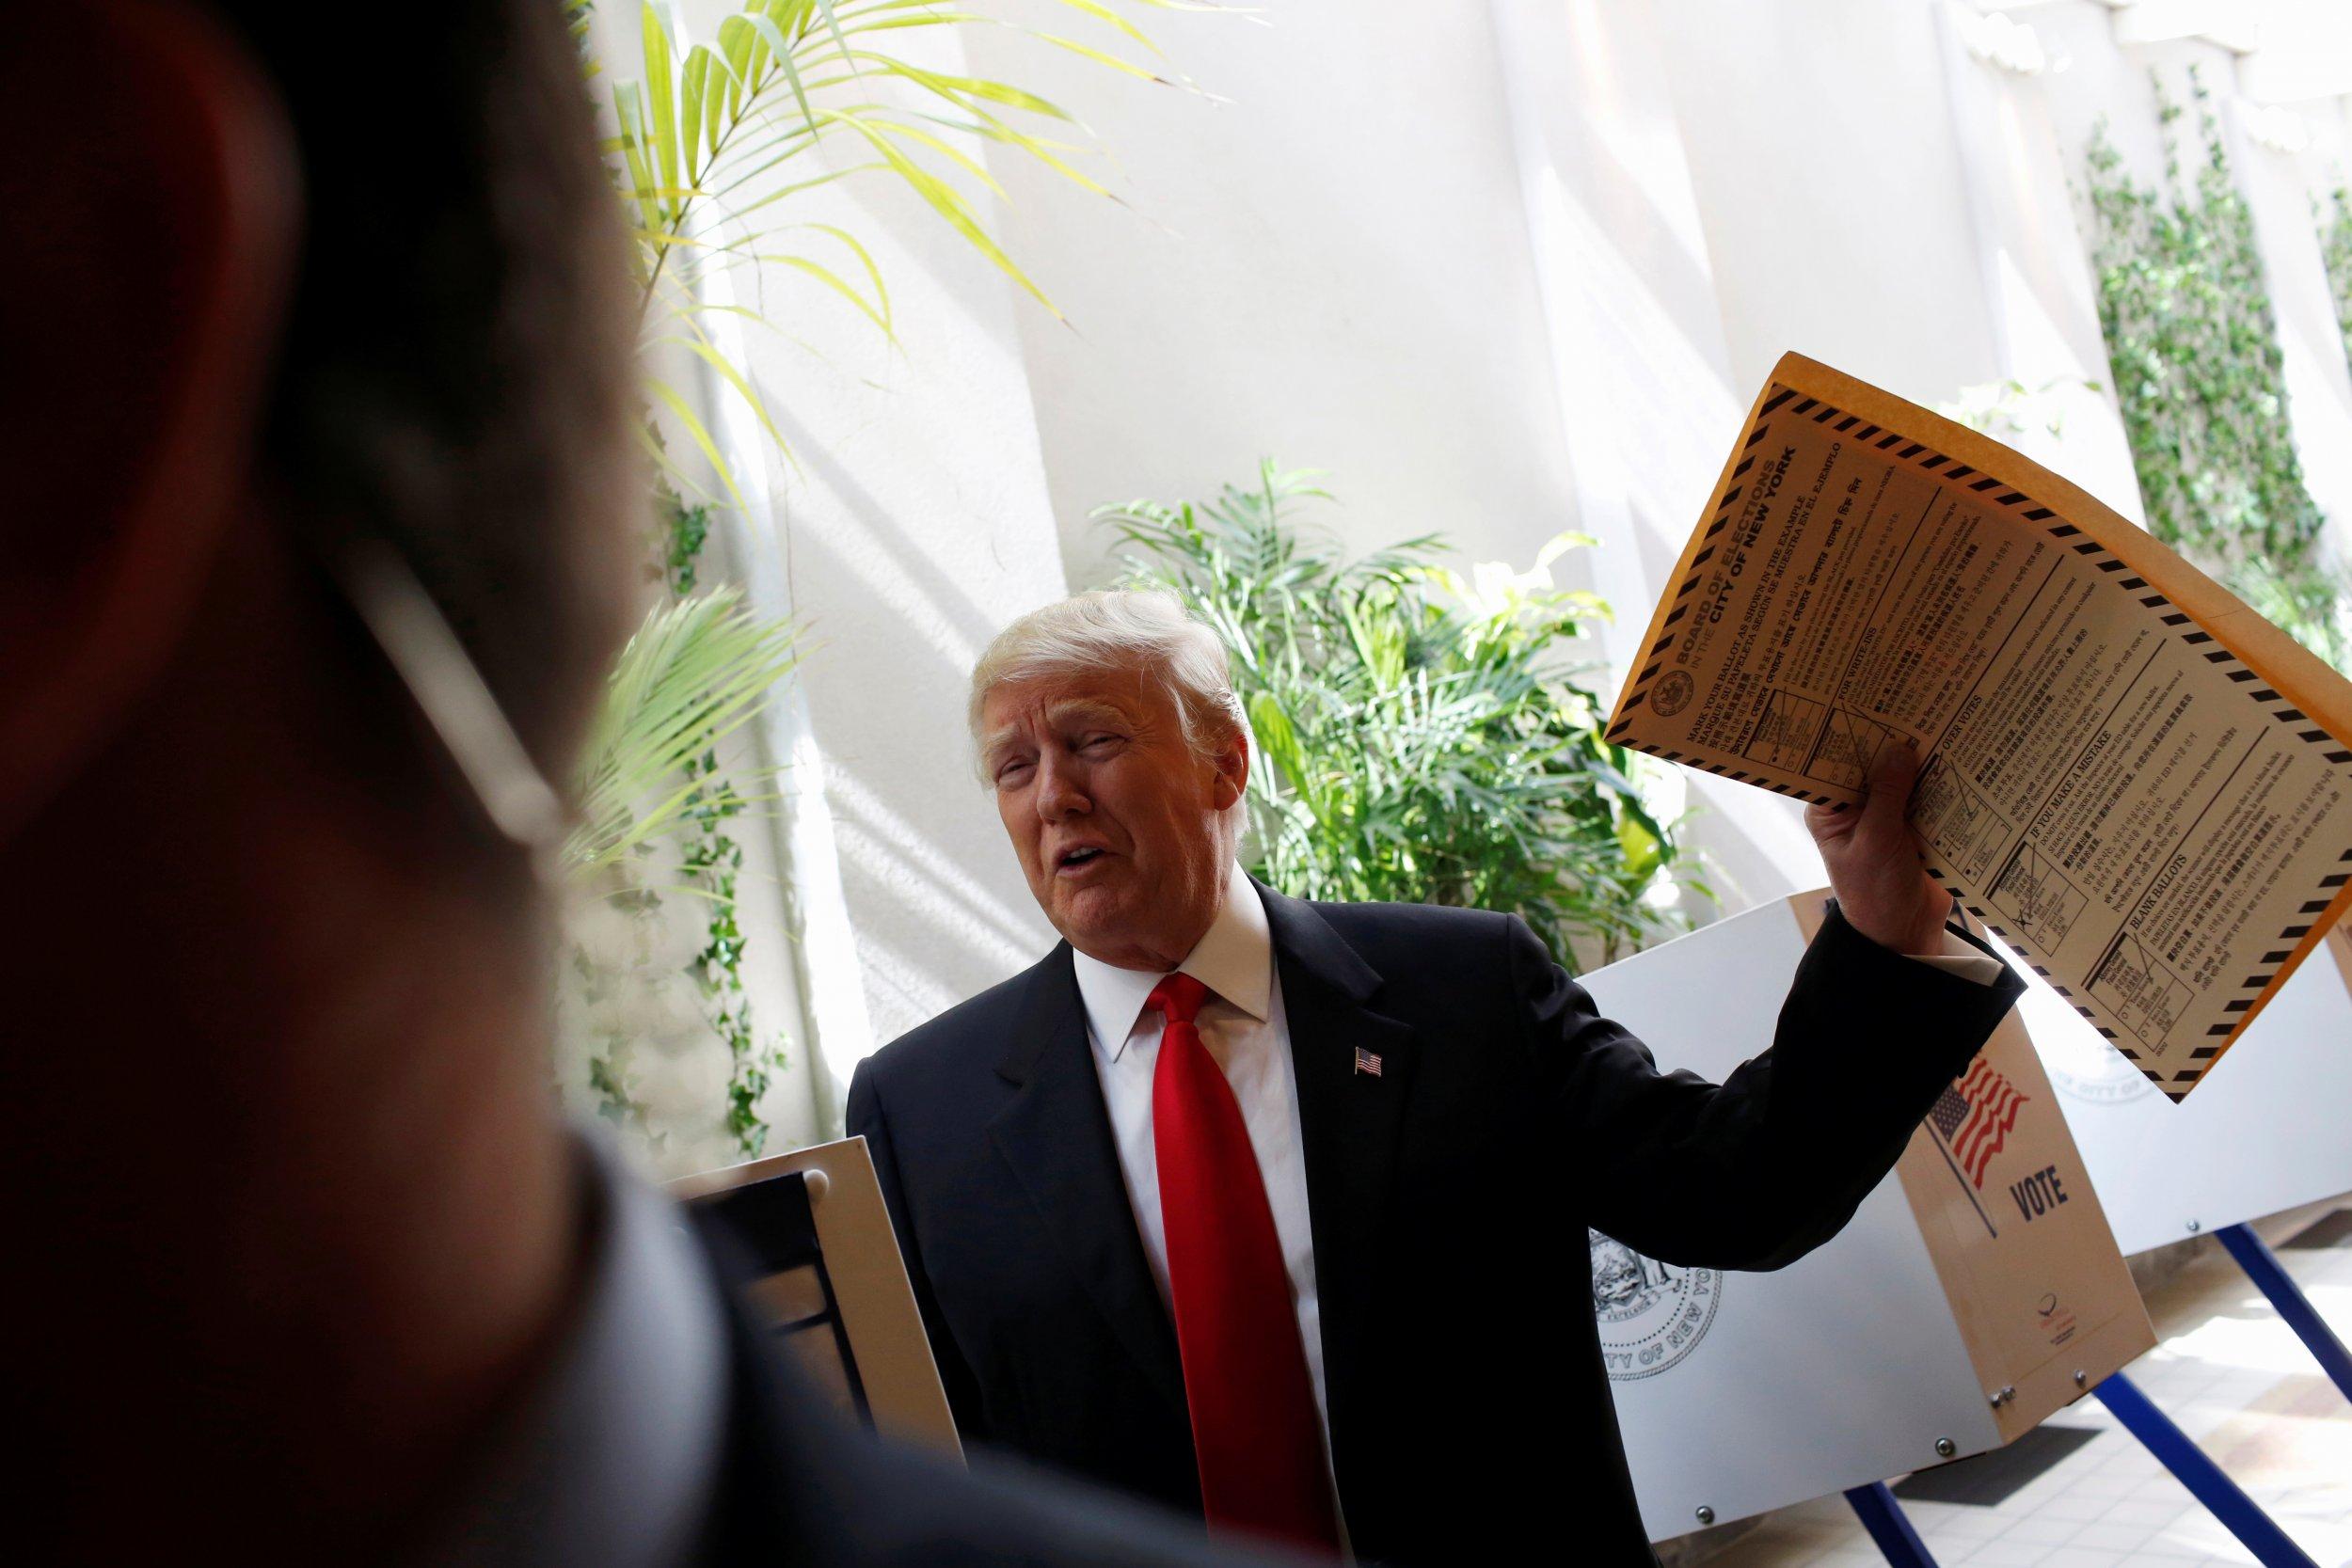 04_19_Donald_Trump_01